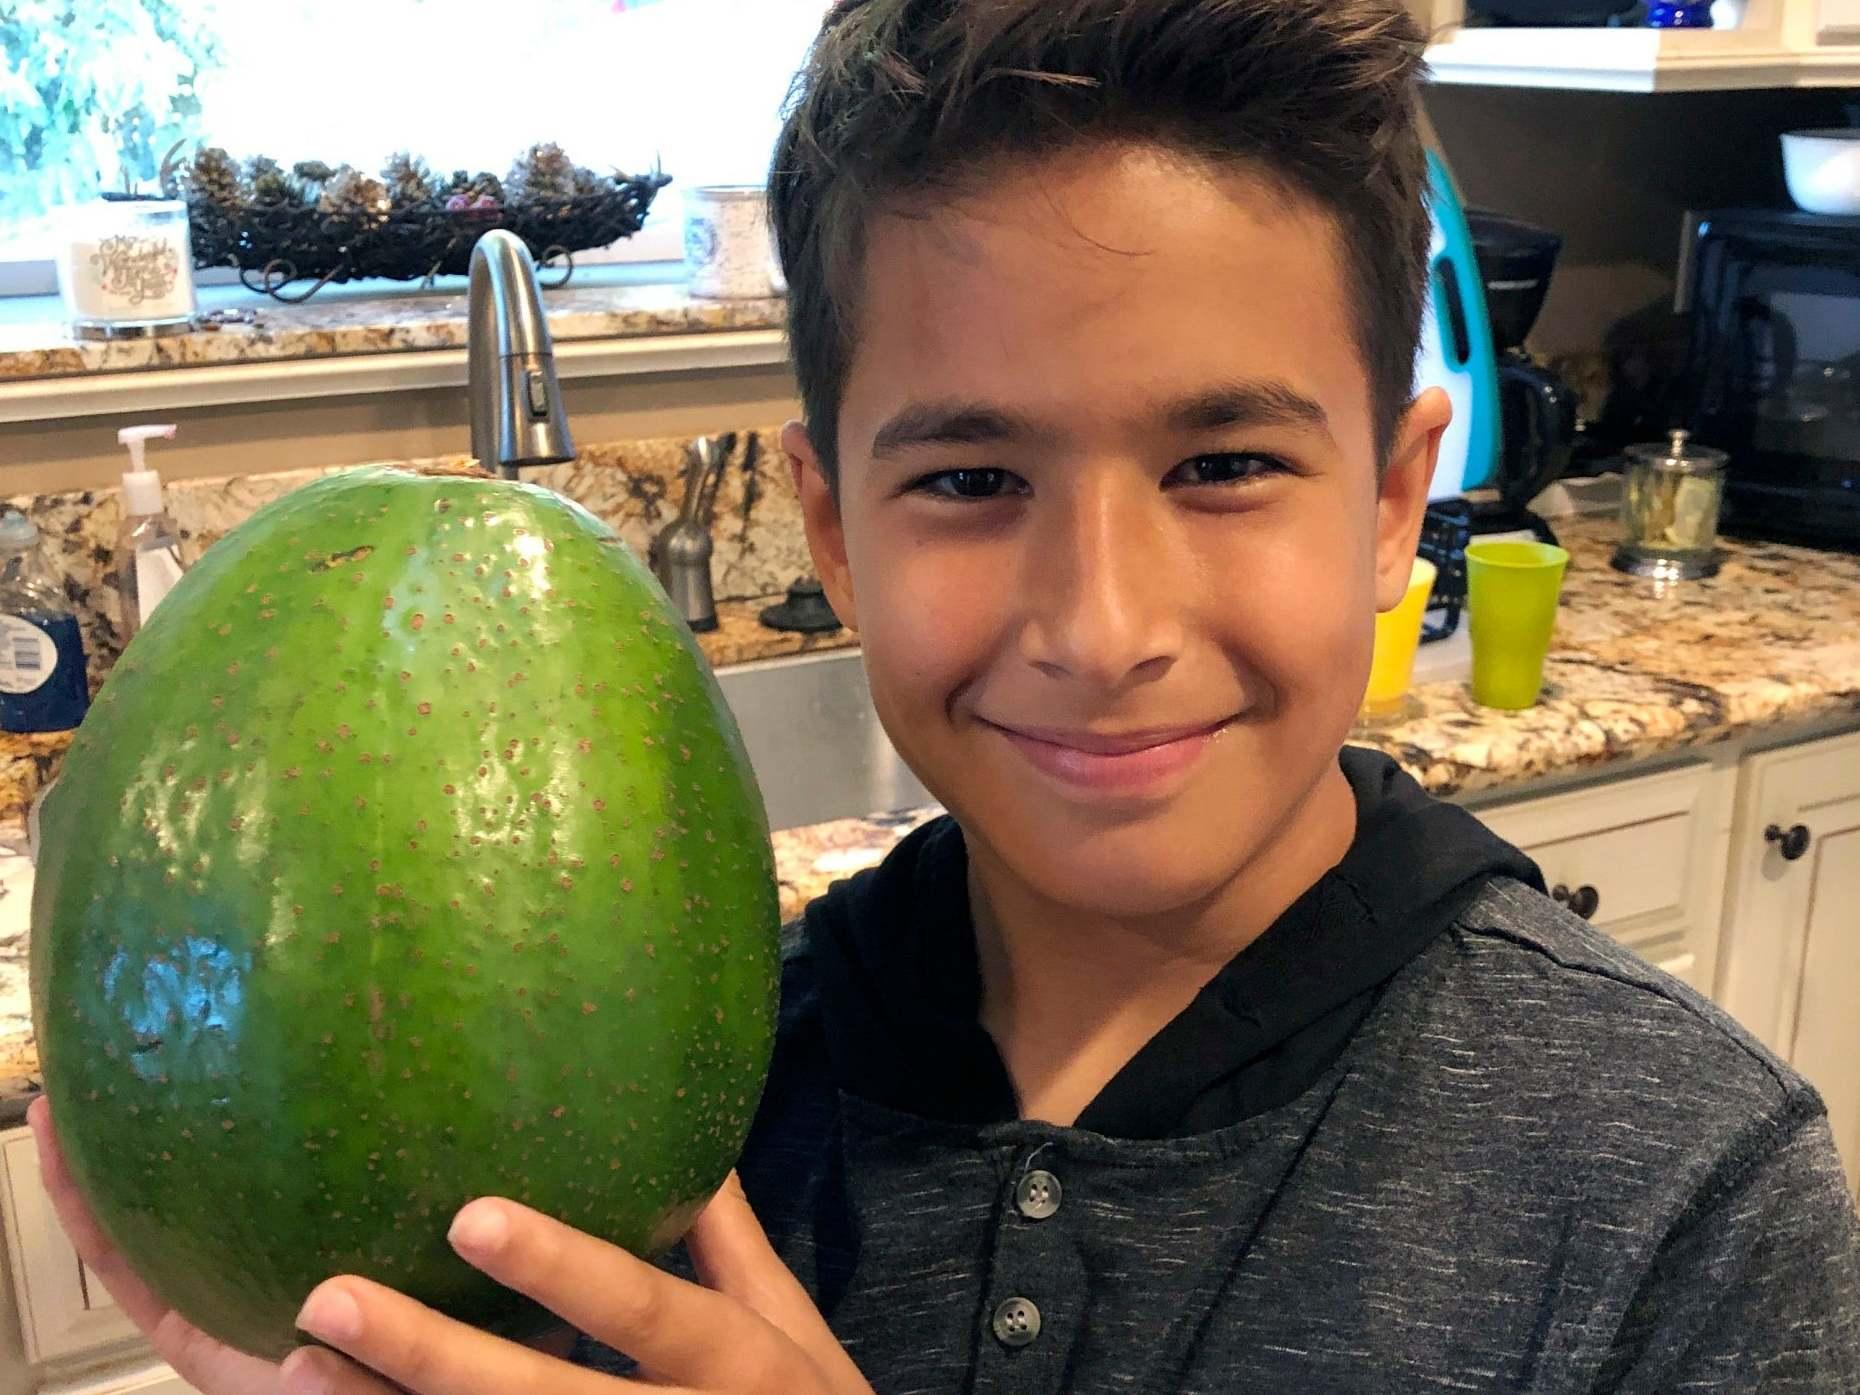 Massive avocado wins record for world's heaviest in Hawaii